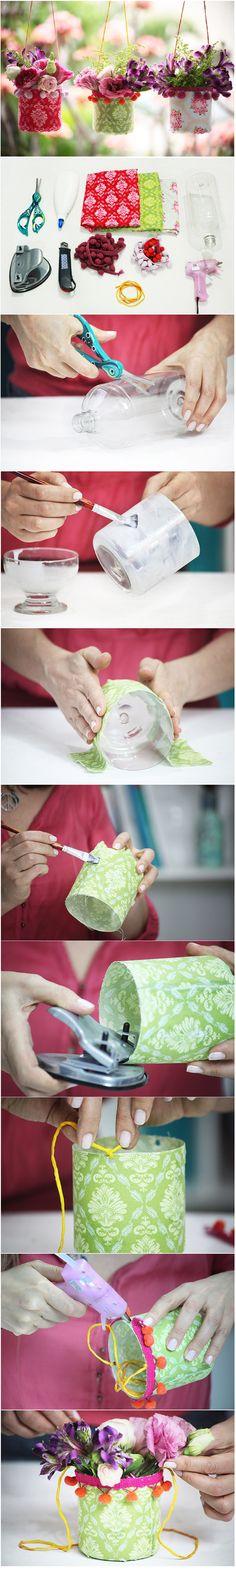 DY Plastic Bottle Hanging Vase Tutorial http://www.goodshomedesign.com/dy-plastic-bottle-hanging-vase-tutorial/